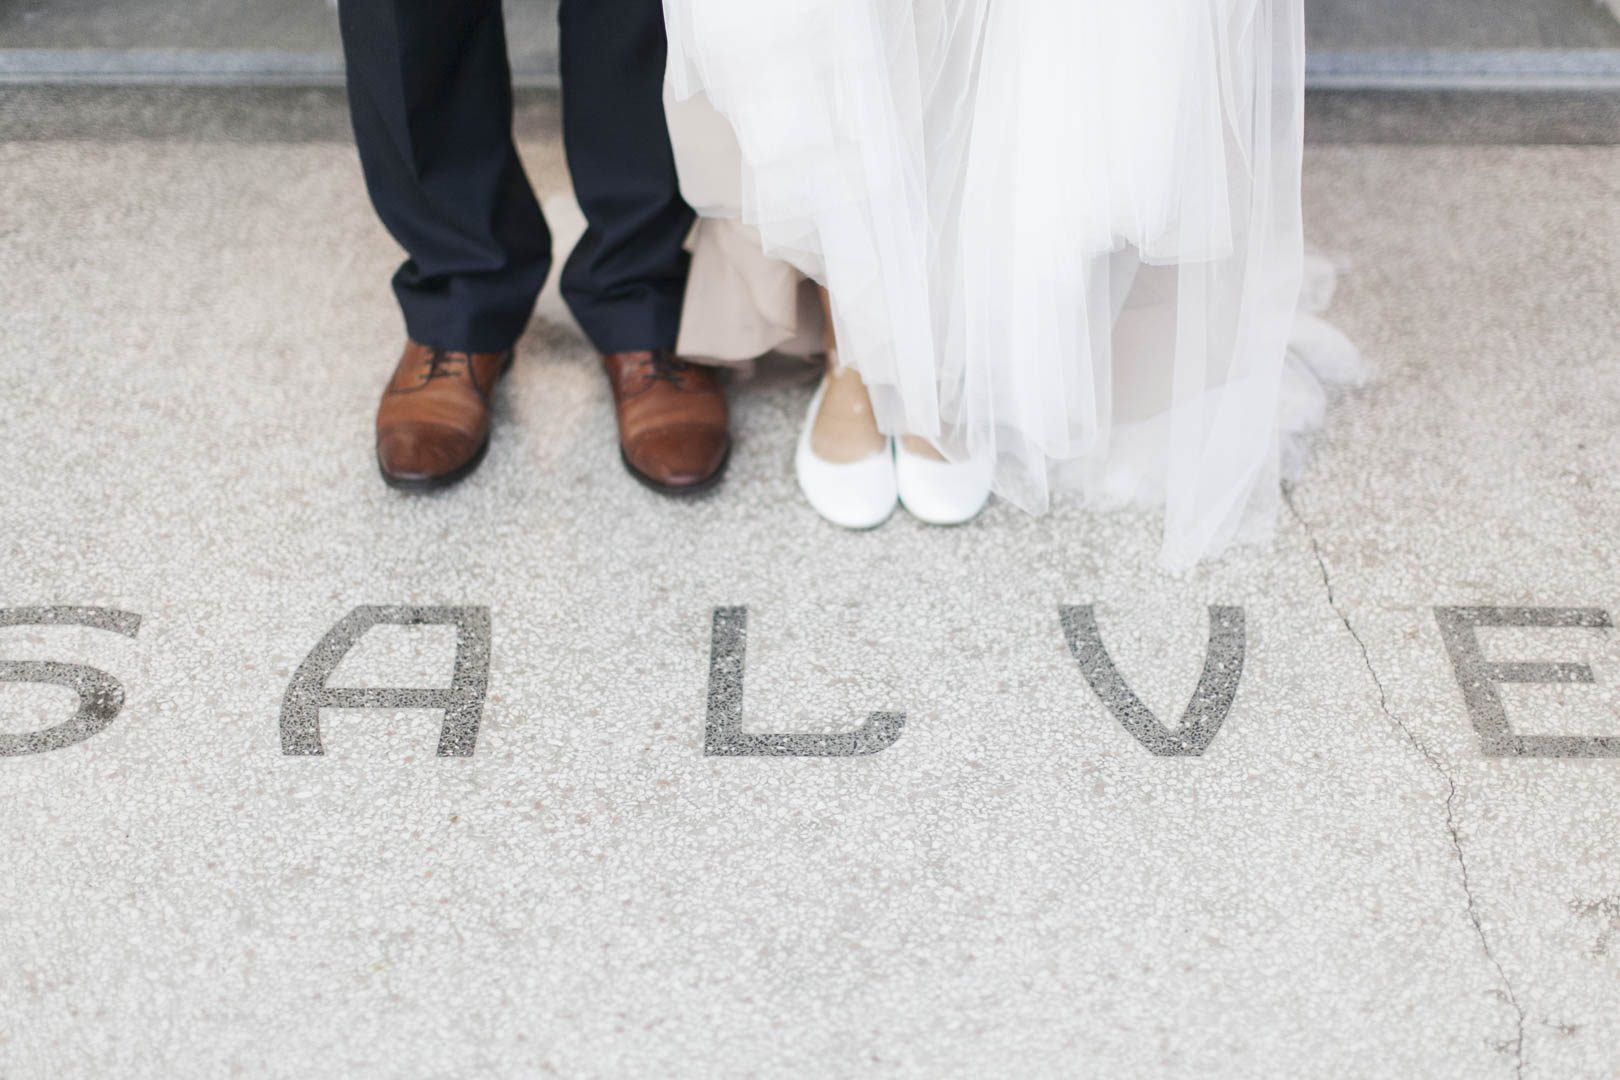 Hochzeit Tessin Fotoshooting The Wedding Day-416